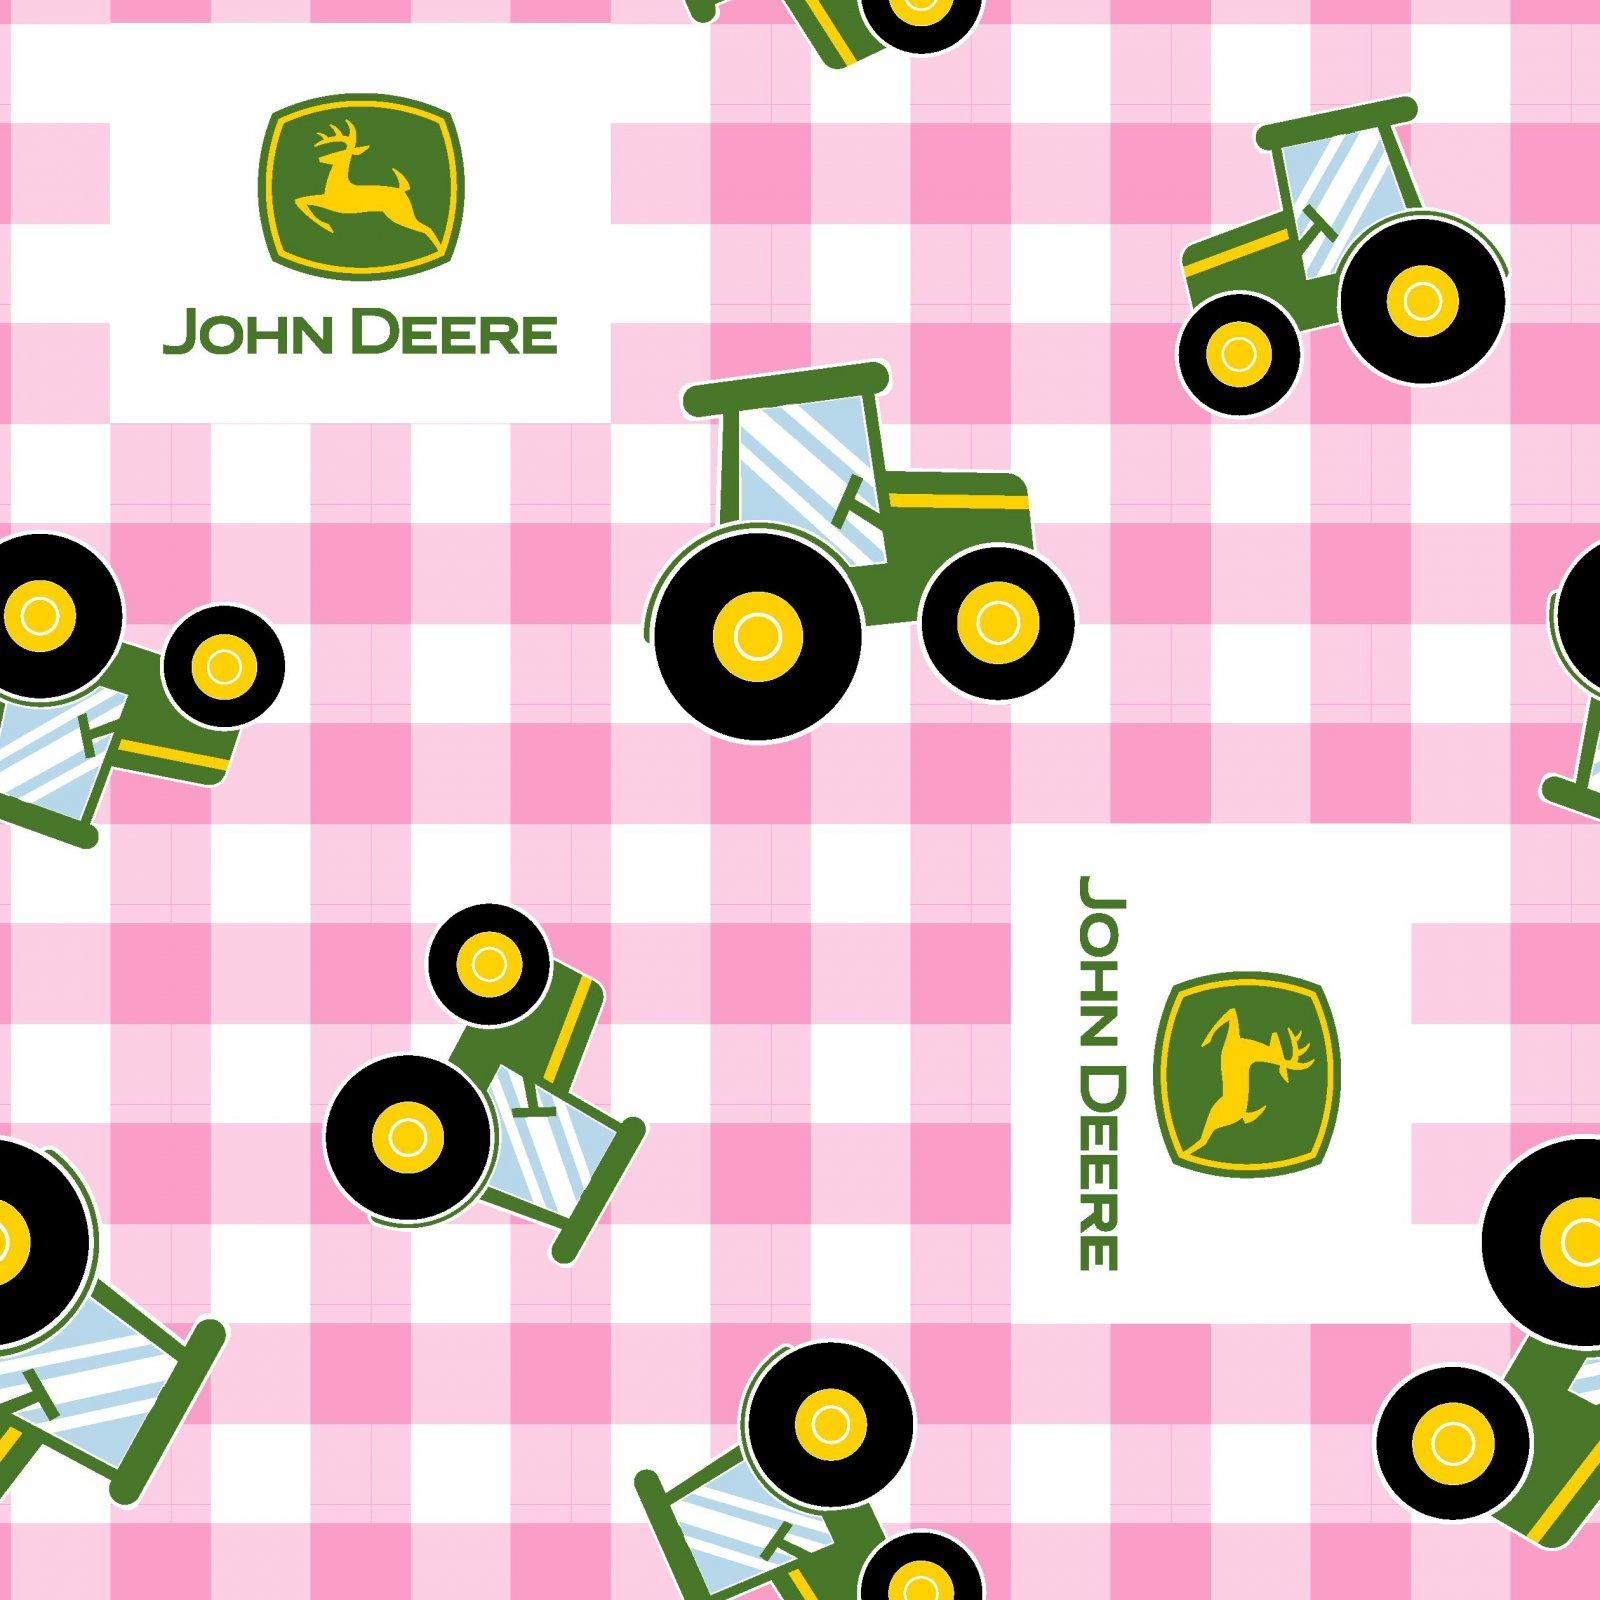 SC-John Deere 76481-A620715 John Deere Plaid